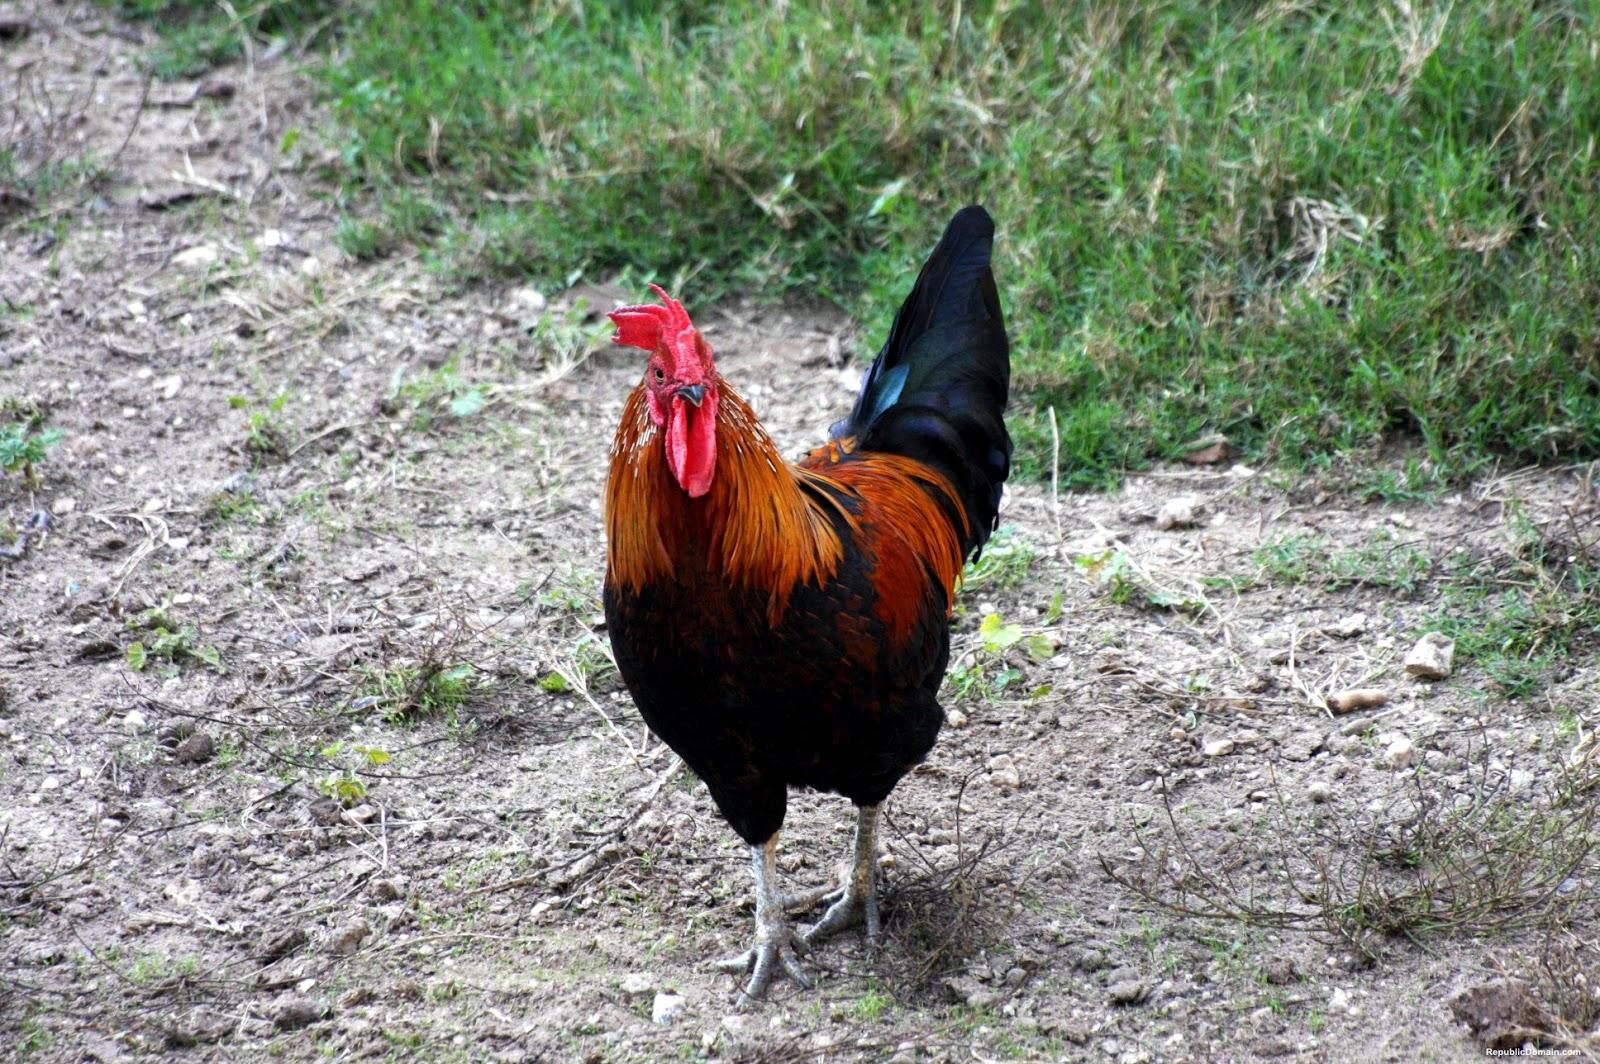 chicken pictures | chicken picture | chickens pictures ...